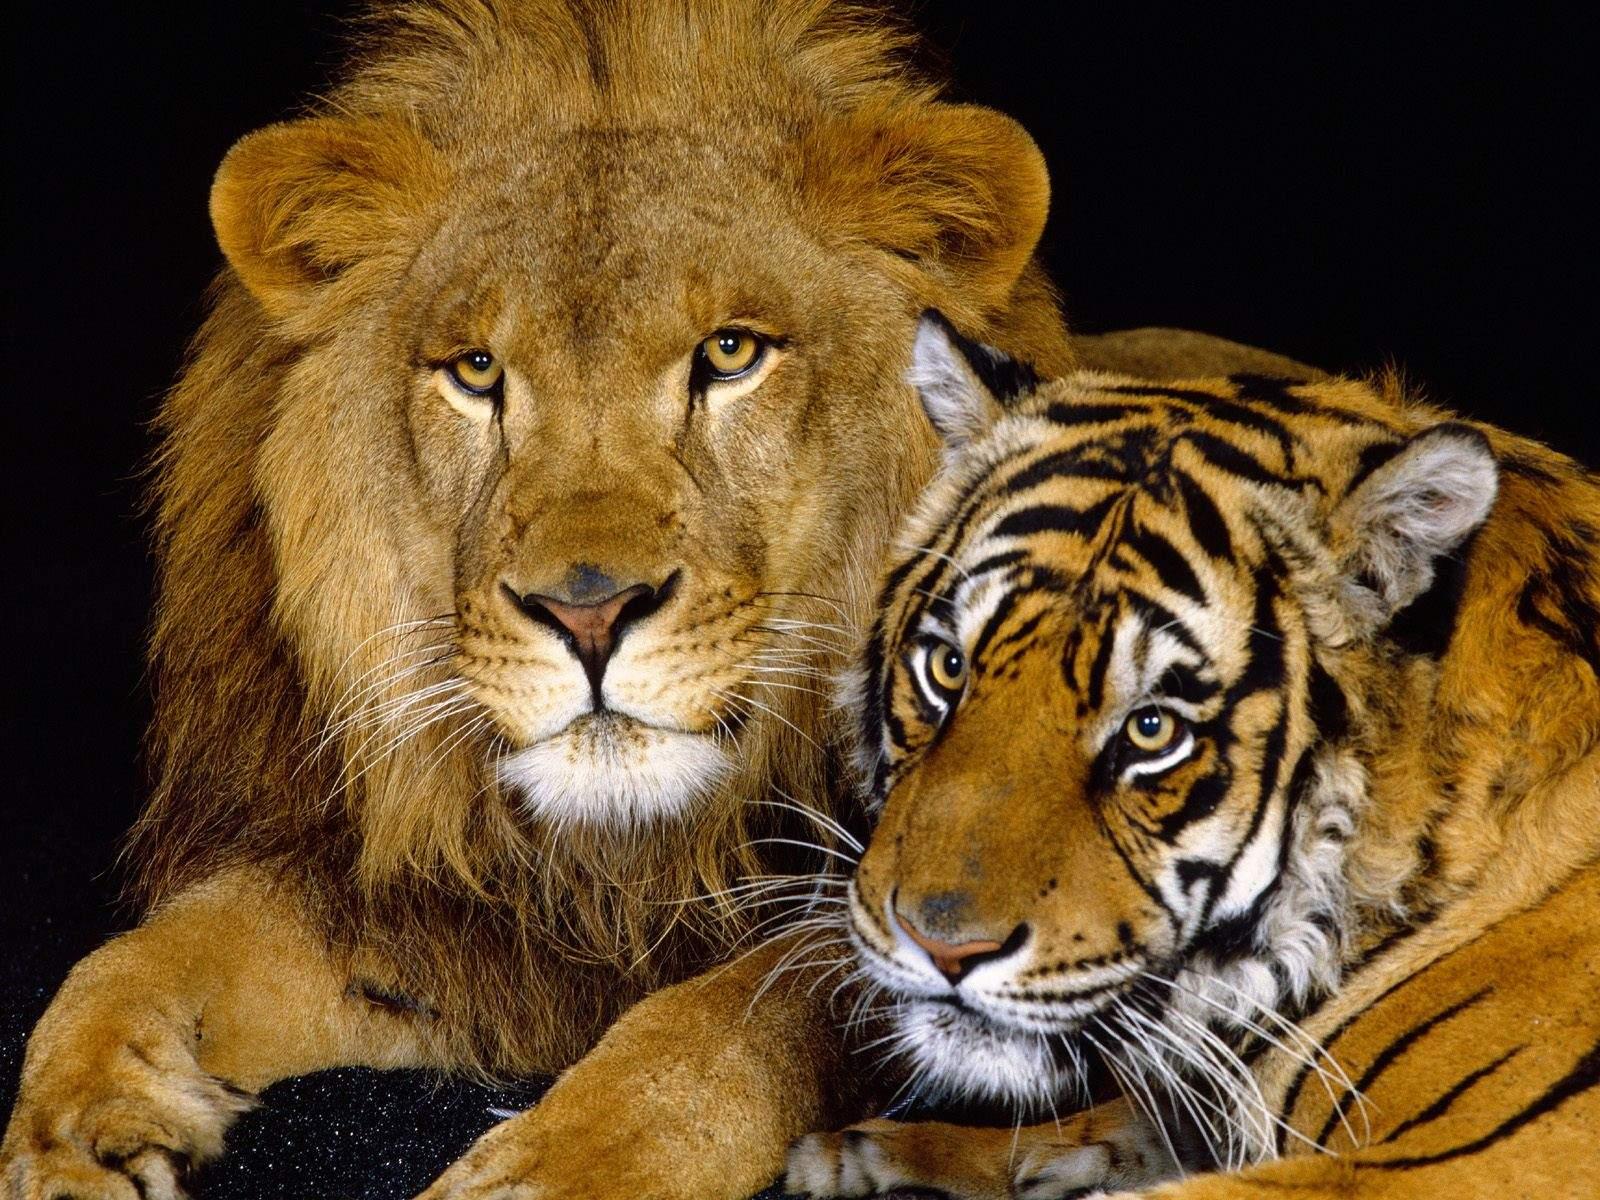 Gambar Binatang